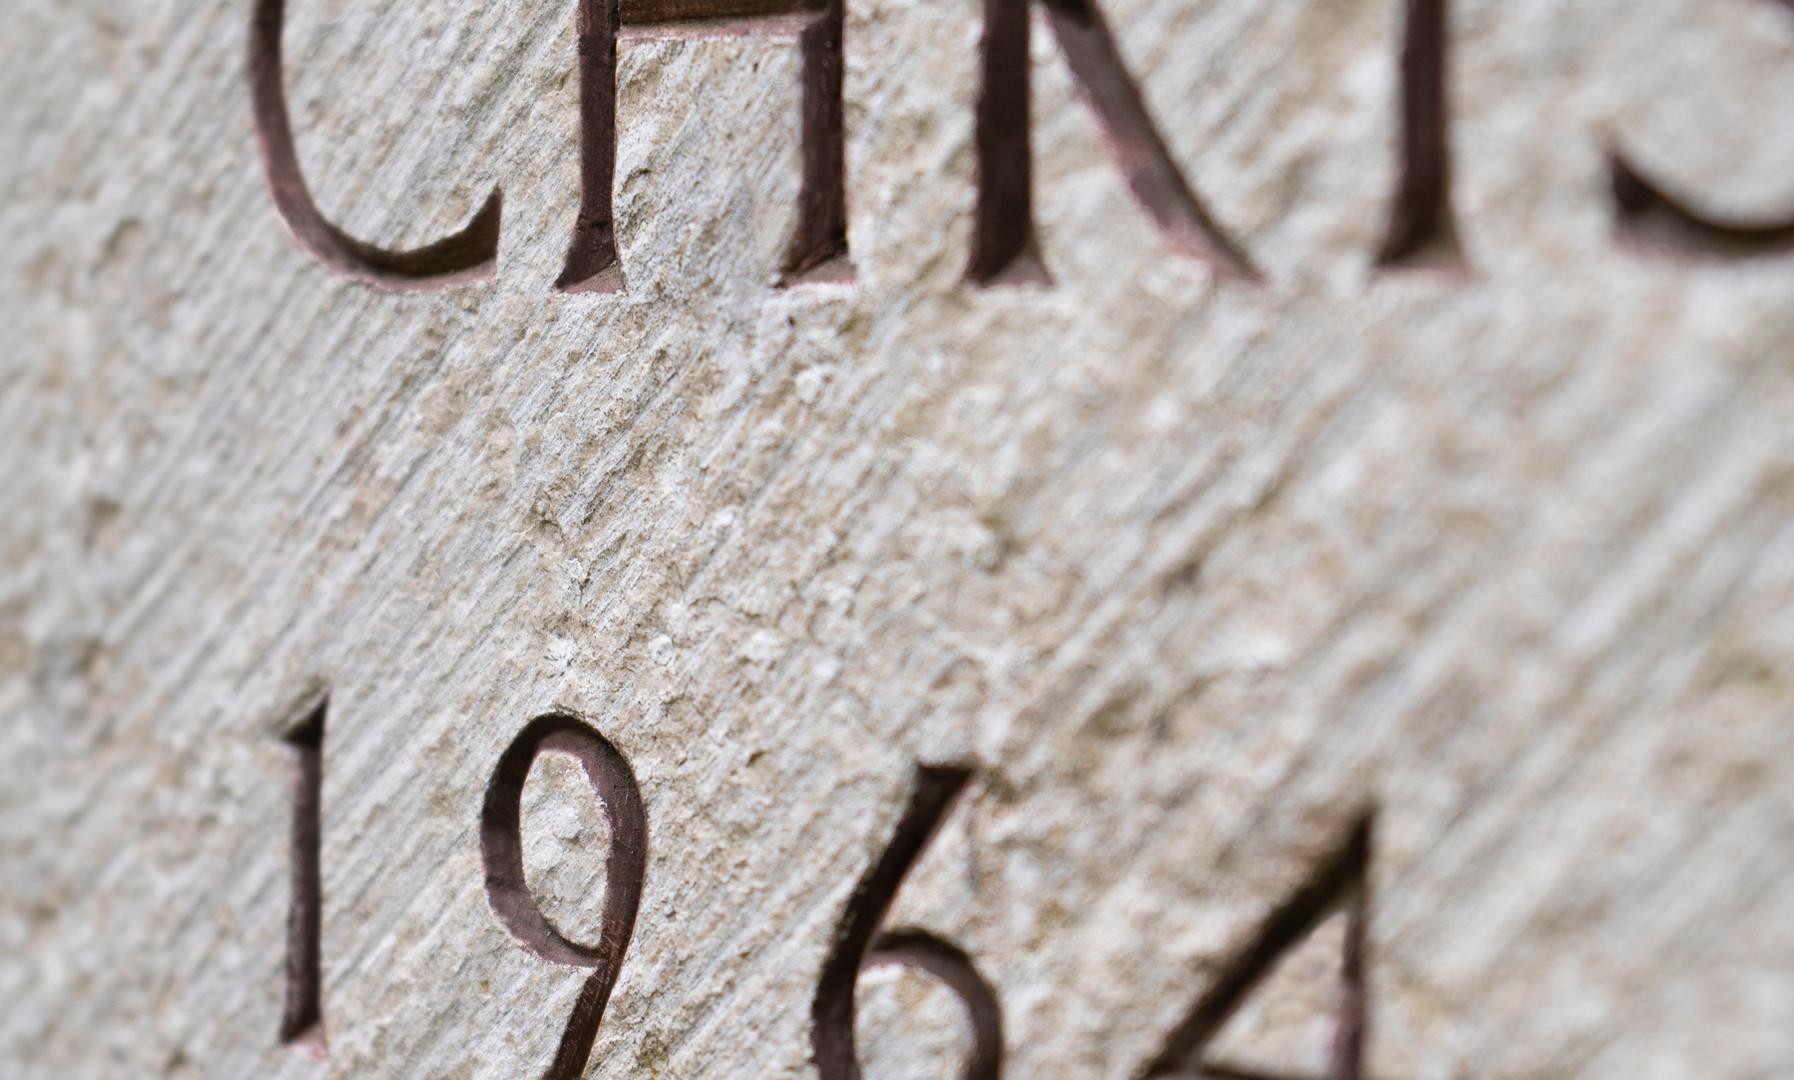 Grabmal-Grabstein-Inschrift-Steinmetz-As